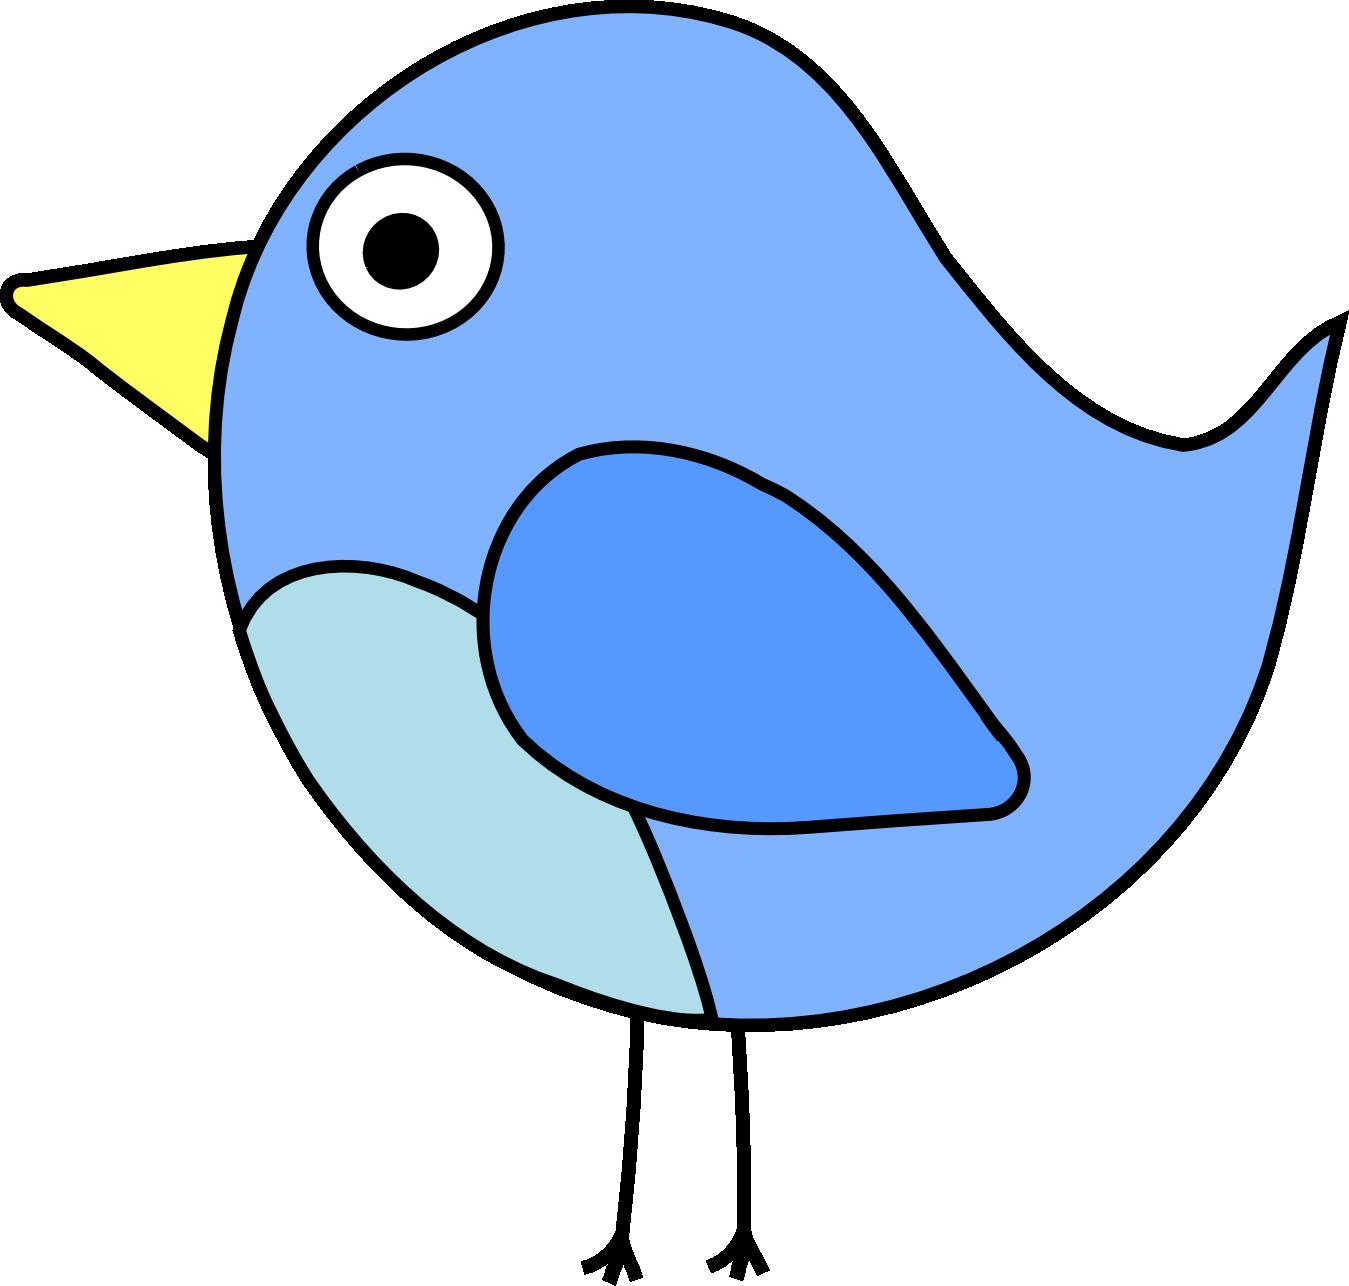 Textbook clipart assignment notebook. Pajarito laminas pinterest bird